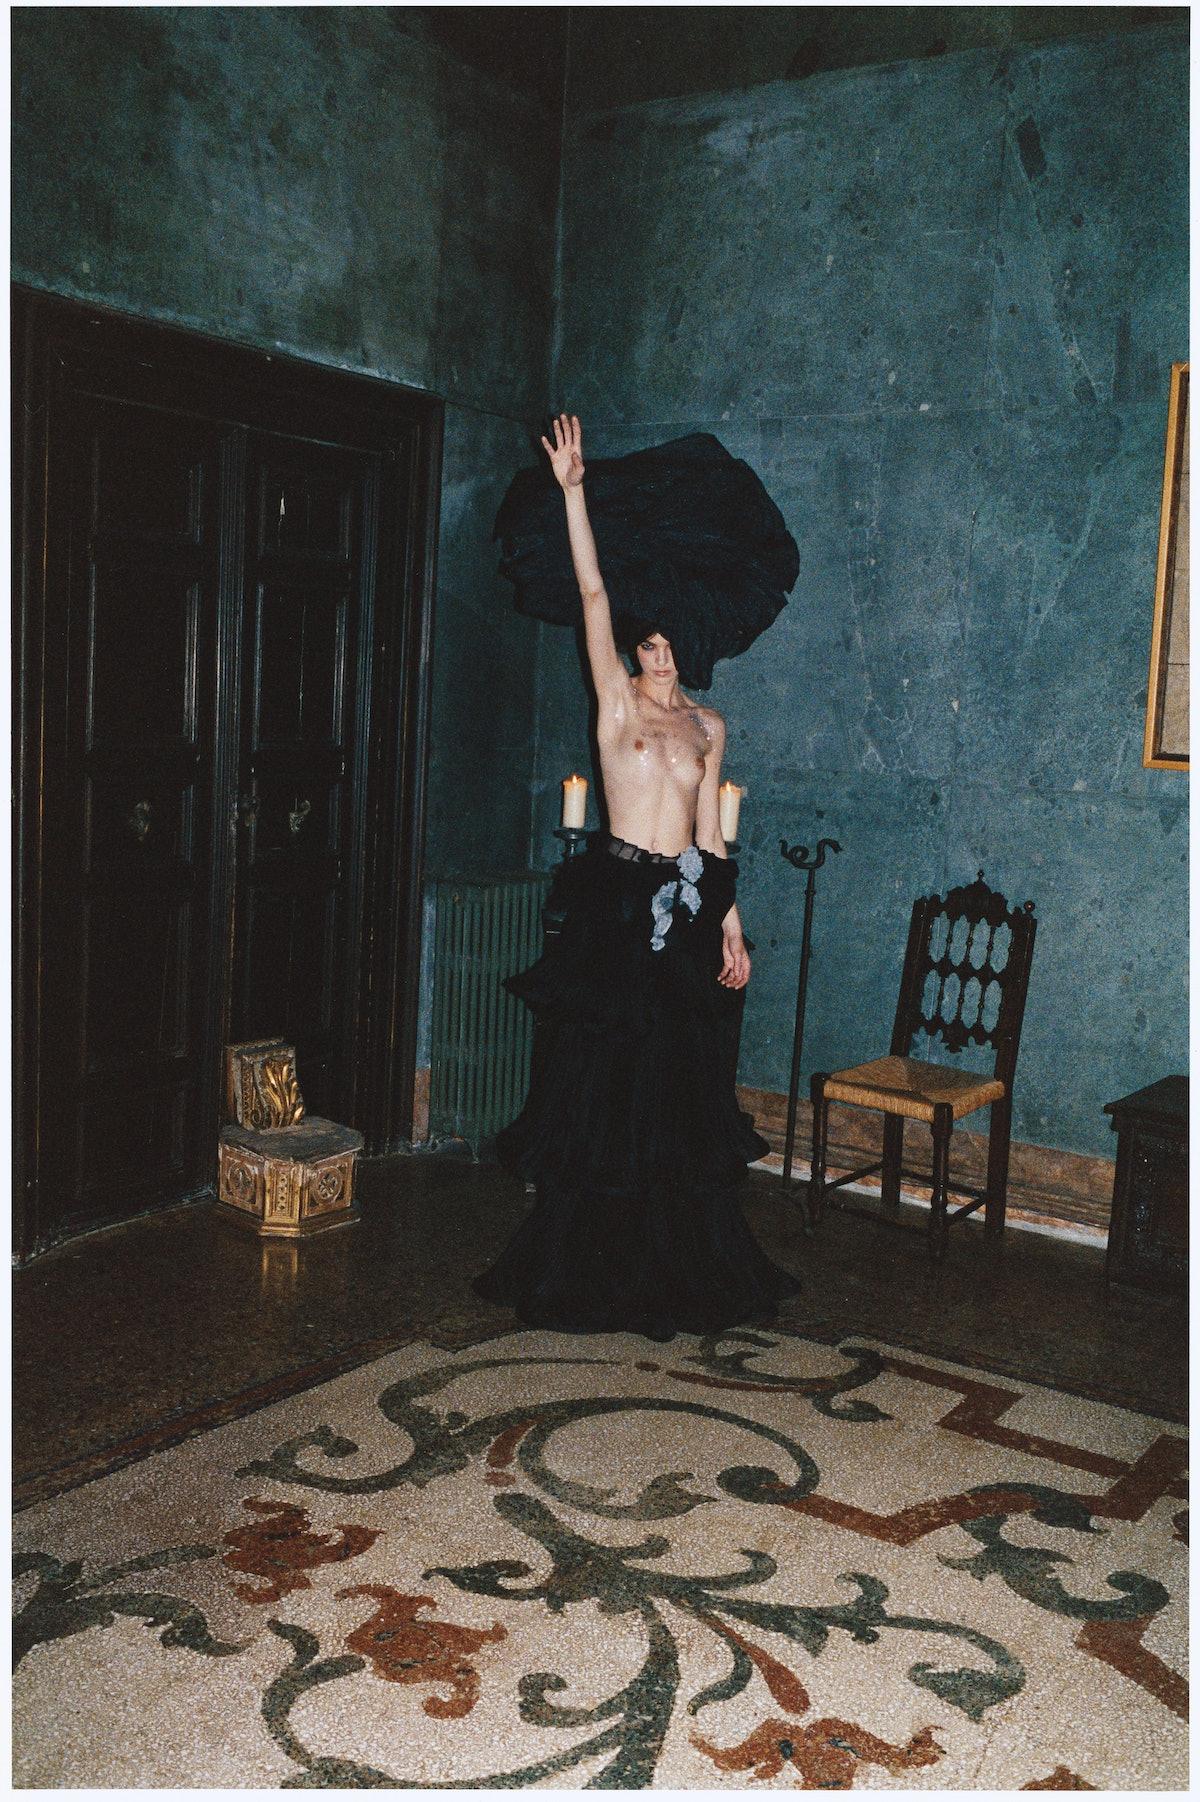 Giorgio Armani's silk skirt, at Saks Fifth Avenue; Giorgio Armani, giorgioarmani.com. Alexander McQueen hat; Louis Vuitton collar (worn as belt).